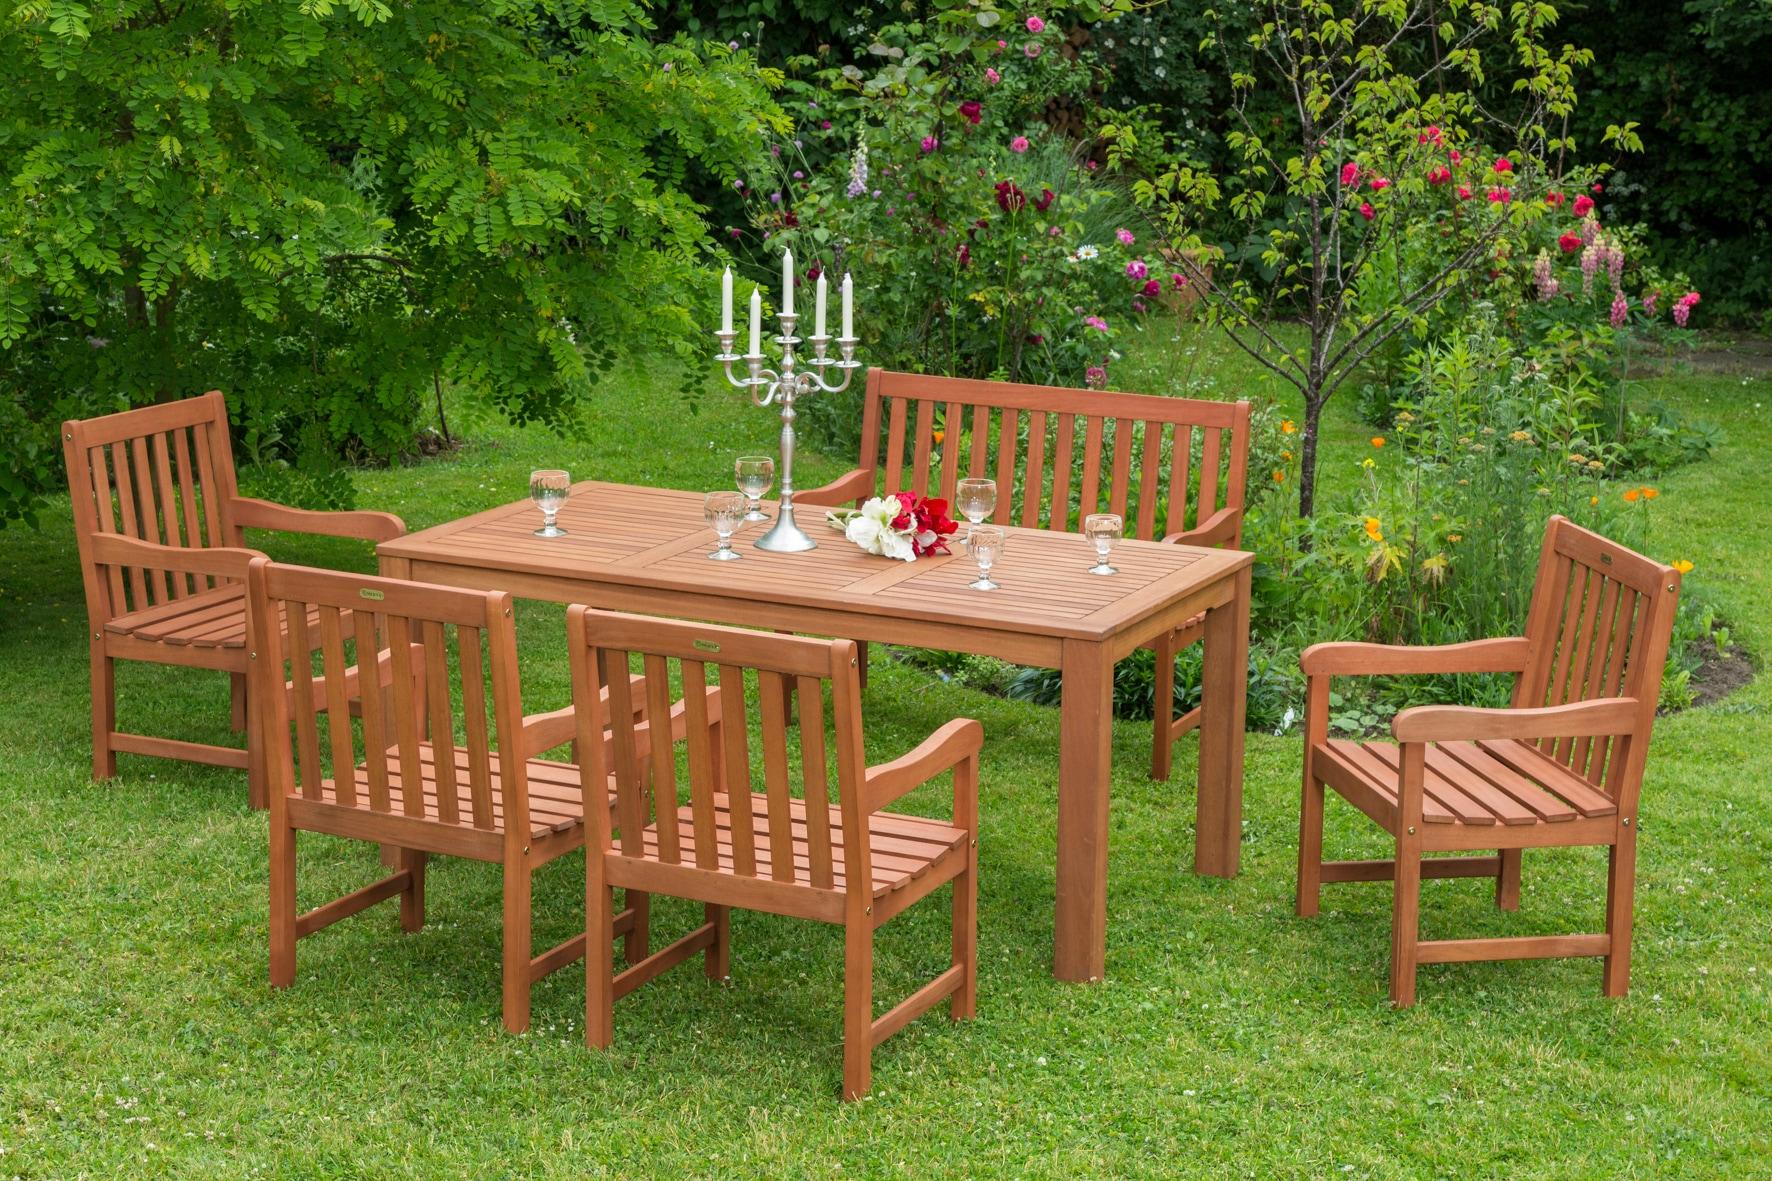 MERXX Gartenmöbelset Santos 4tlg 2 Sessel Bank Tisch Eukalyptusholz natur